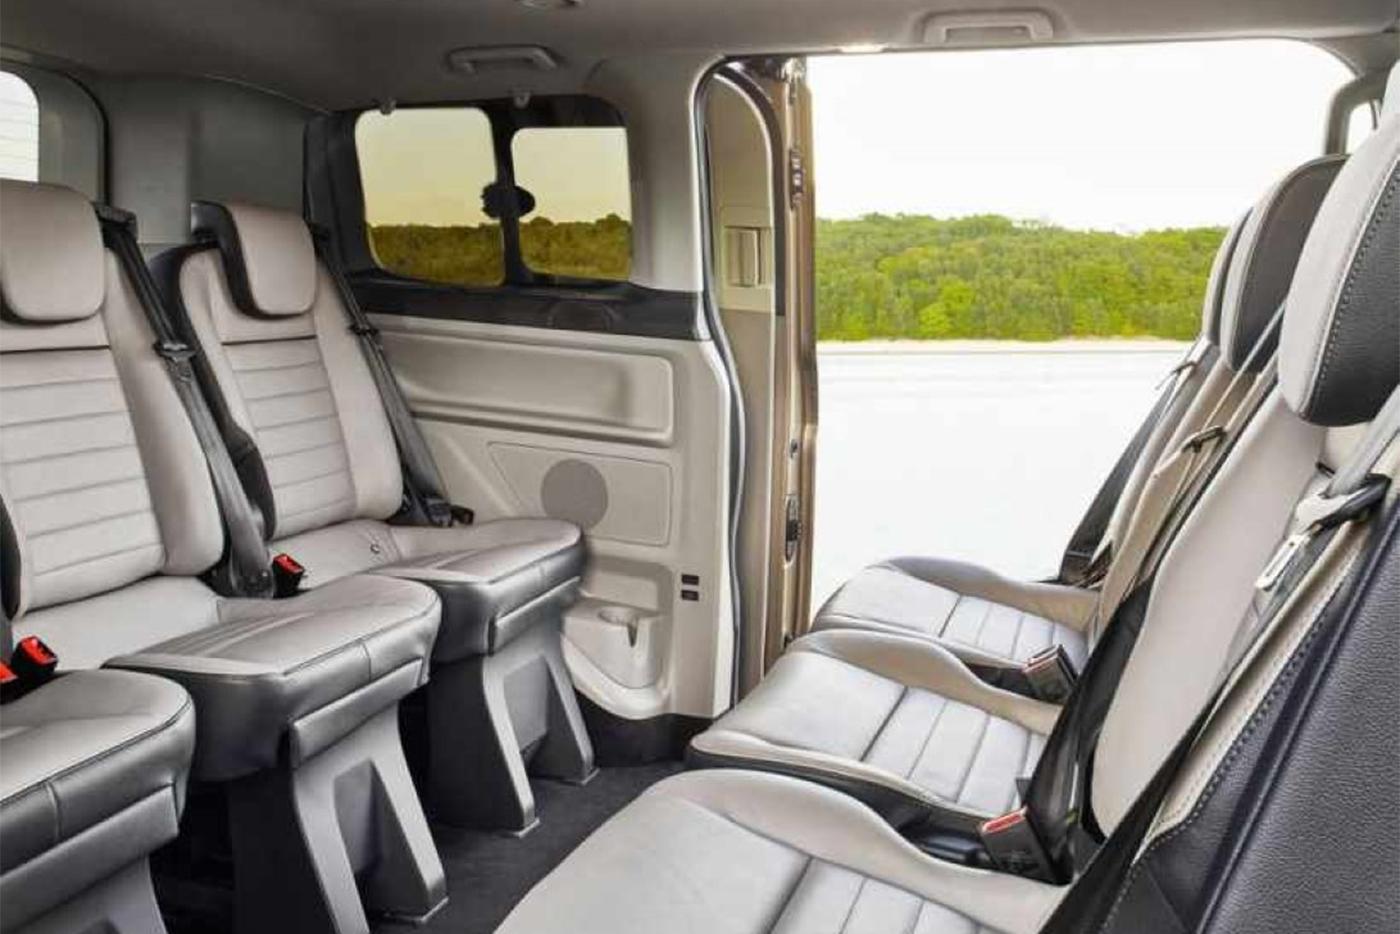 2019-ford-tourneo-custom-interior.jpg